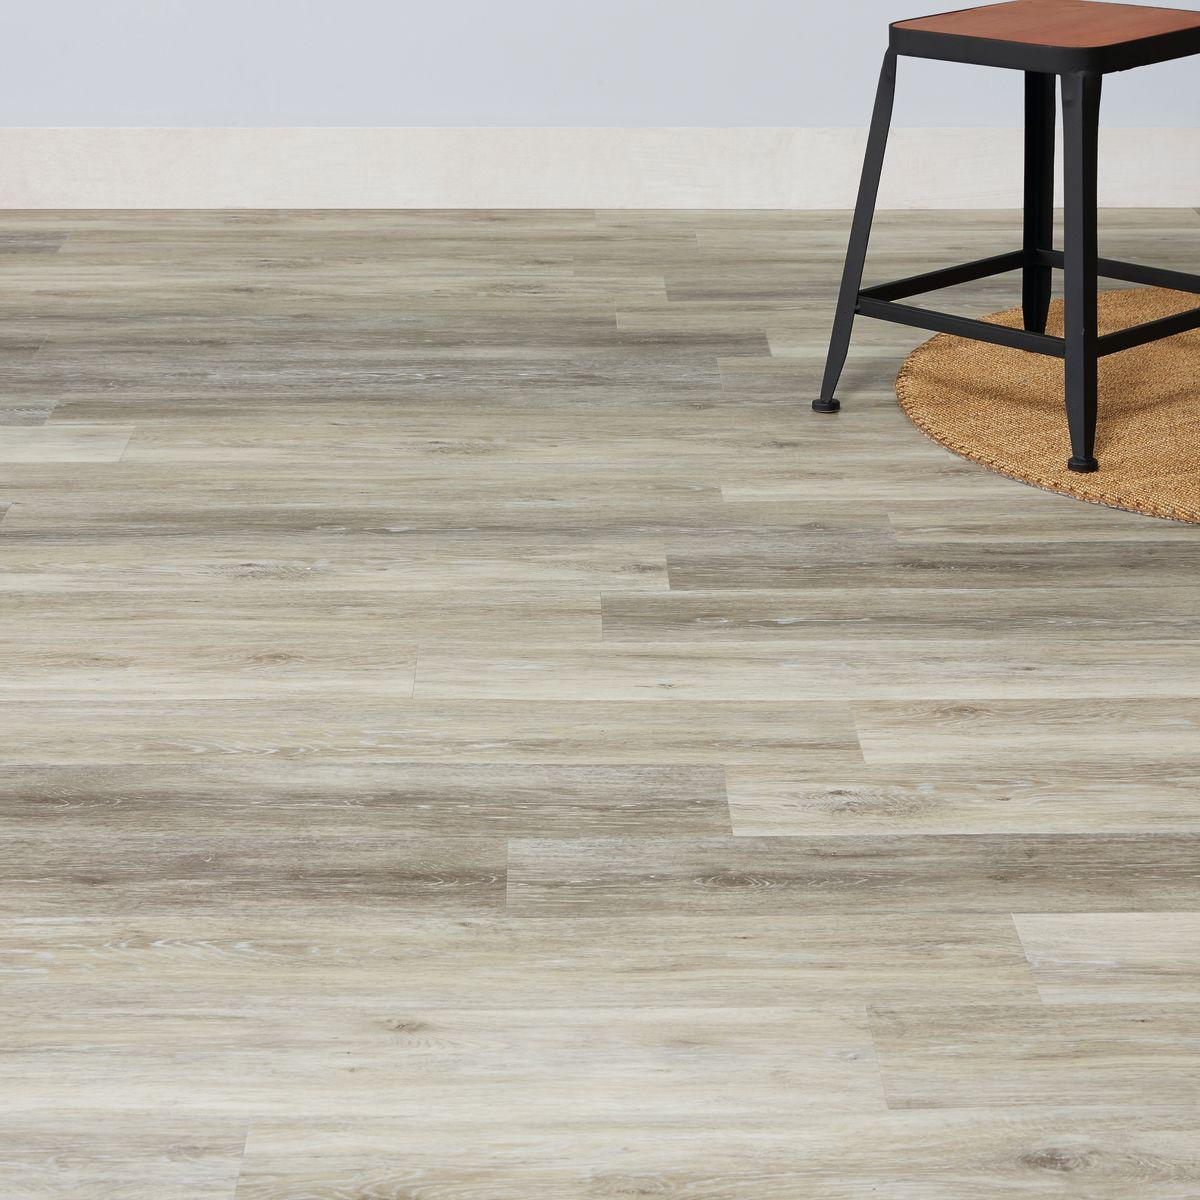 Posa pavimento pvc parquet flottante prezzi pavimento for Pavimento vinilico adesivo leroy merlin